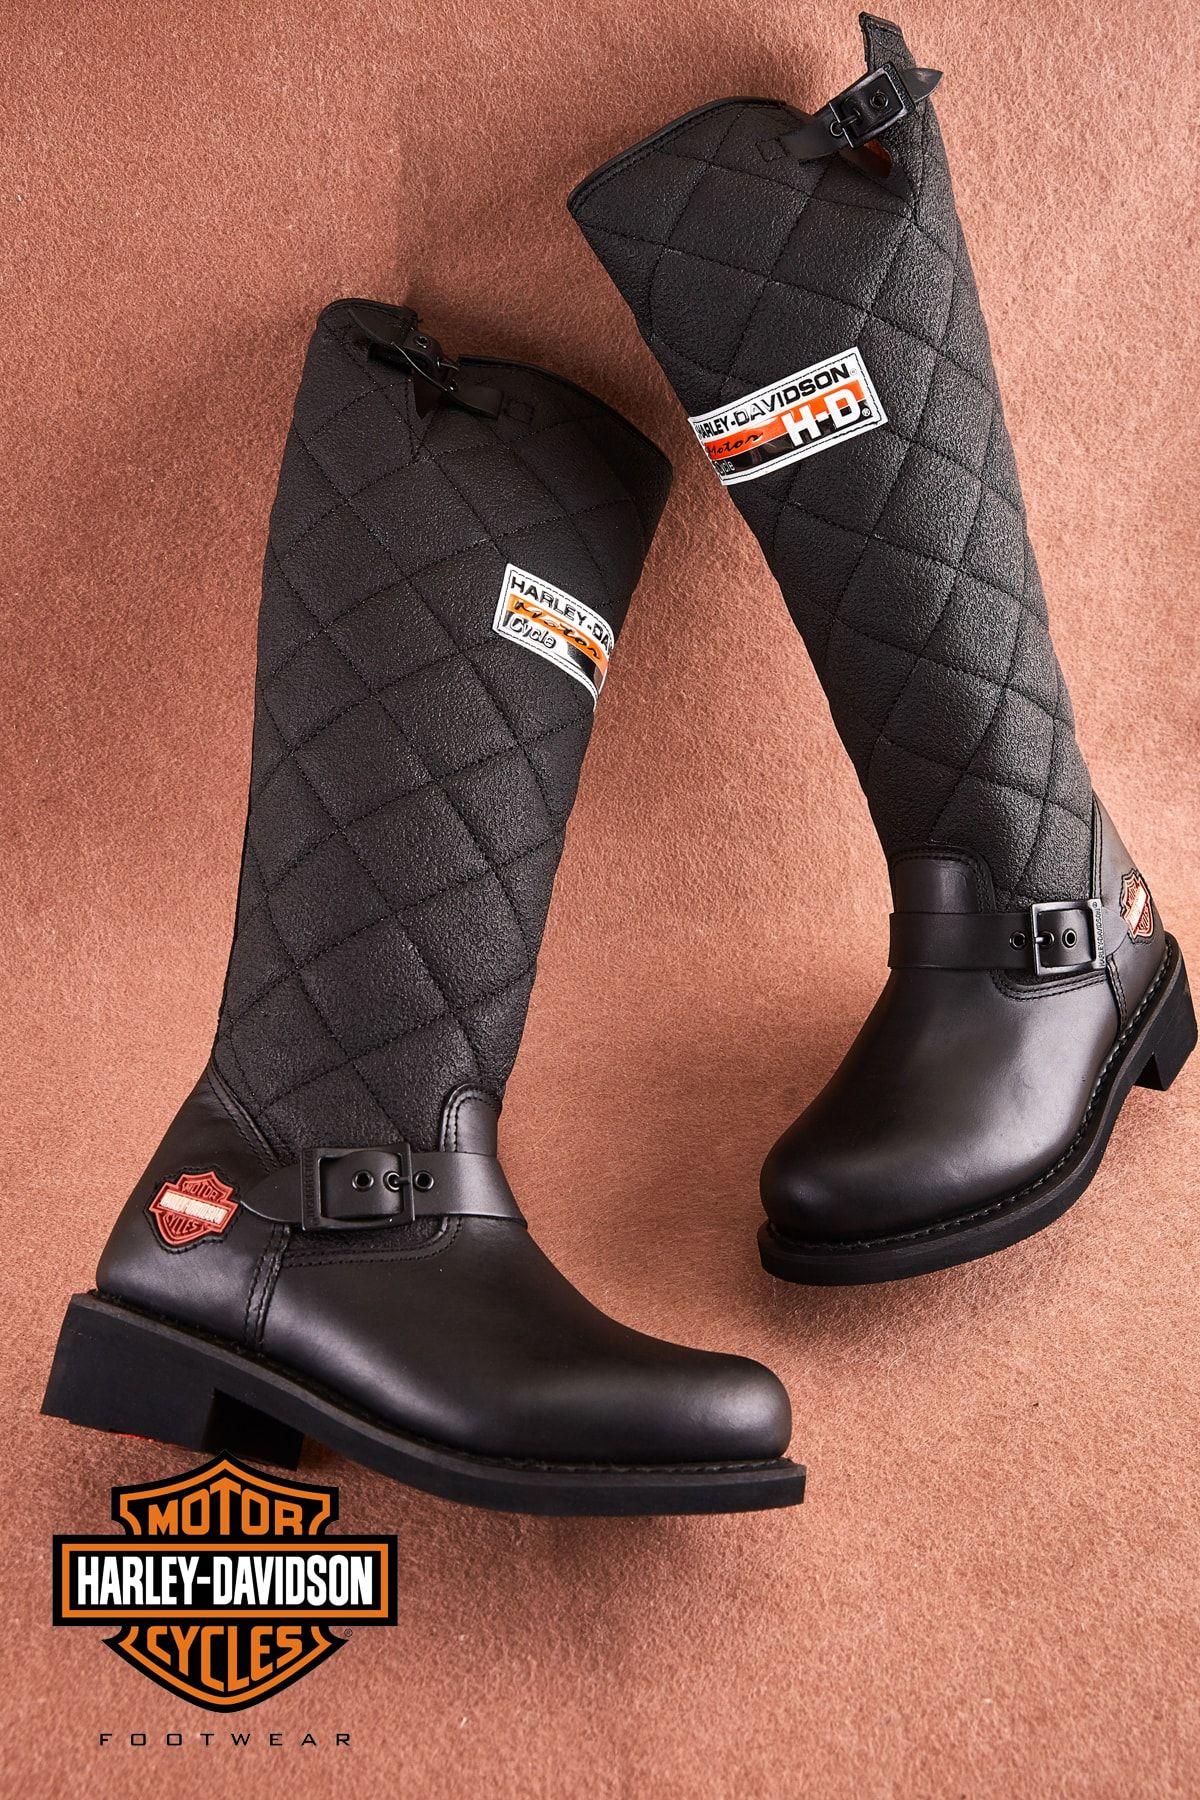 Harley Davidson Hakiki Deri Siyah Kadin Cizme Trendyol 2020 Cizmeler Harley Davidson Hunter Boot